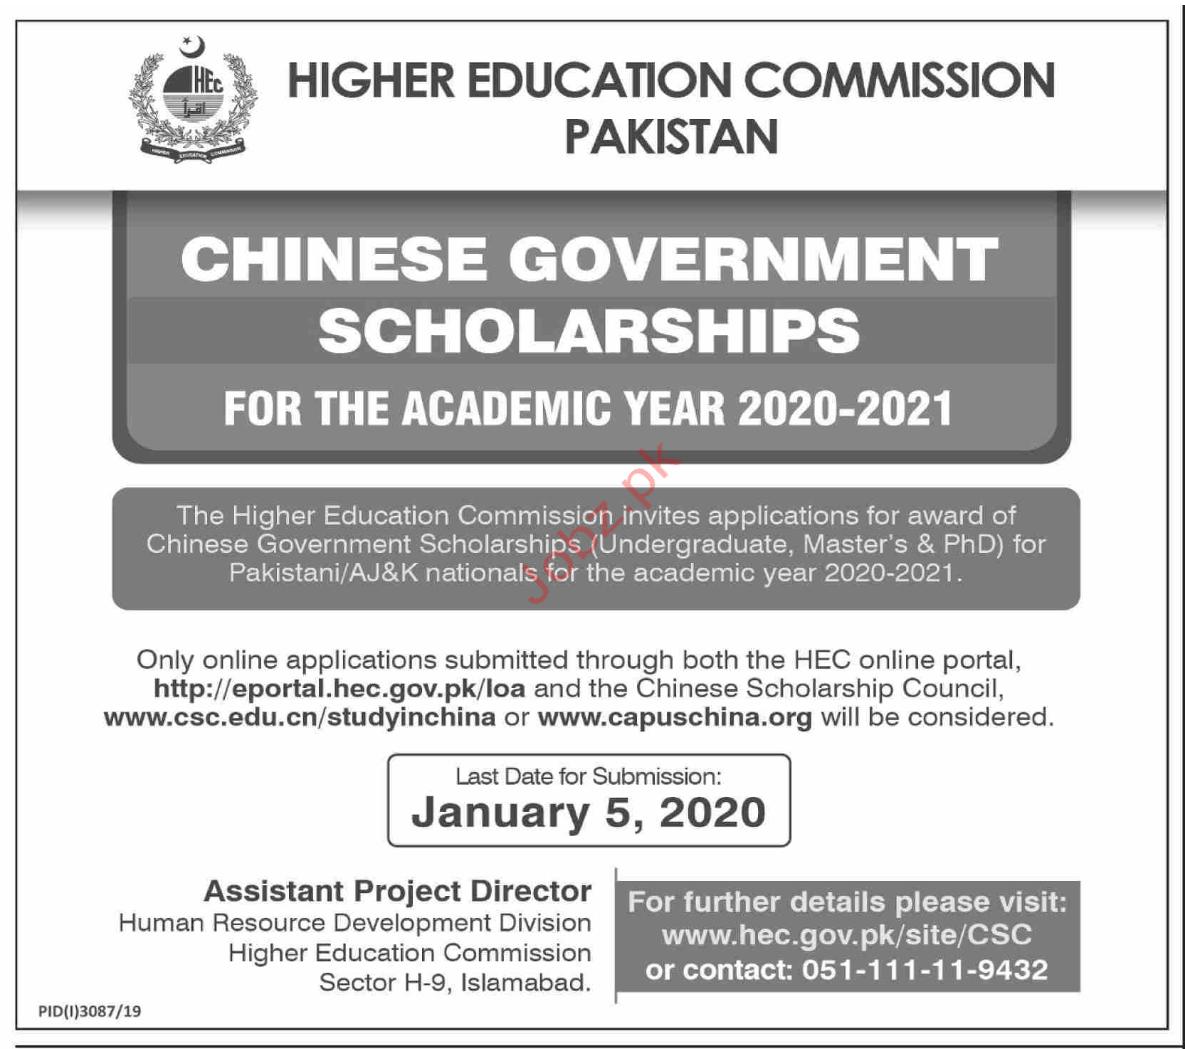 HEC Chinese Govt Scholarships 2020-21